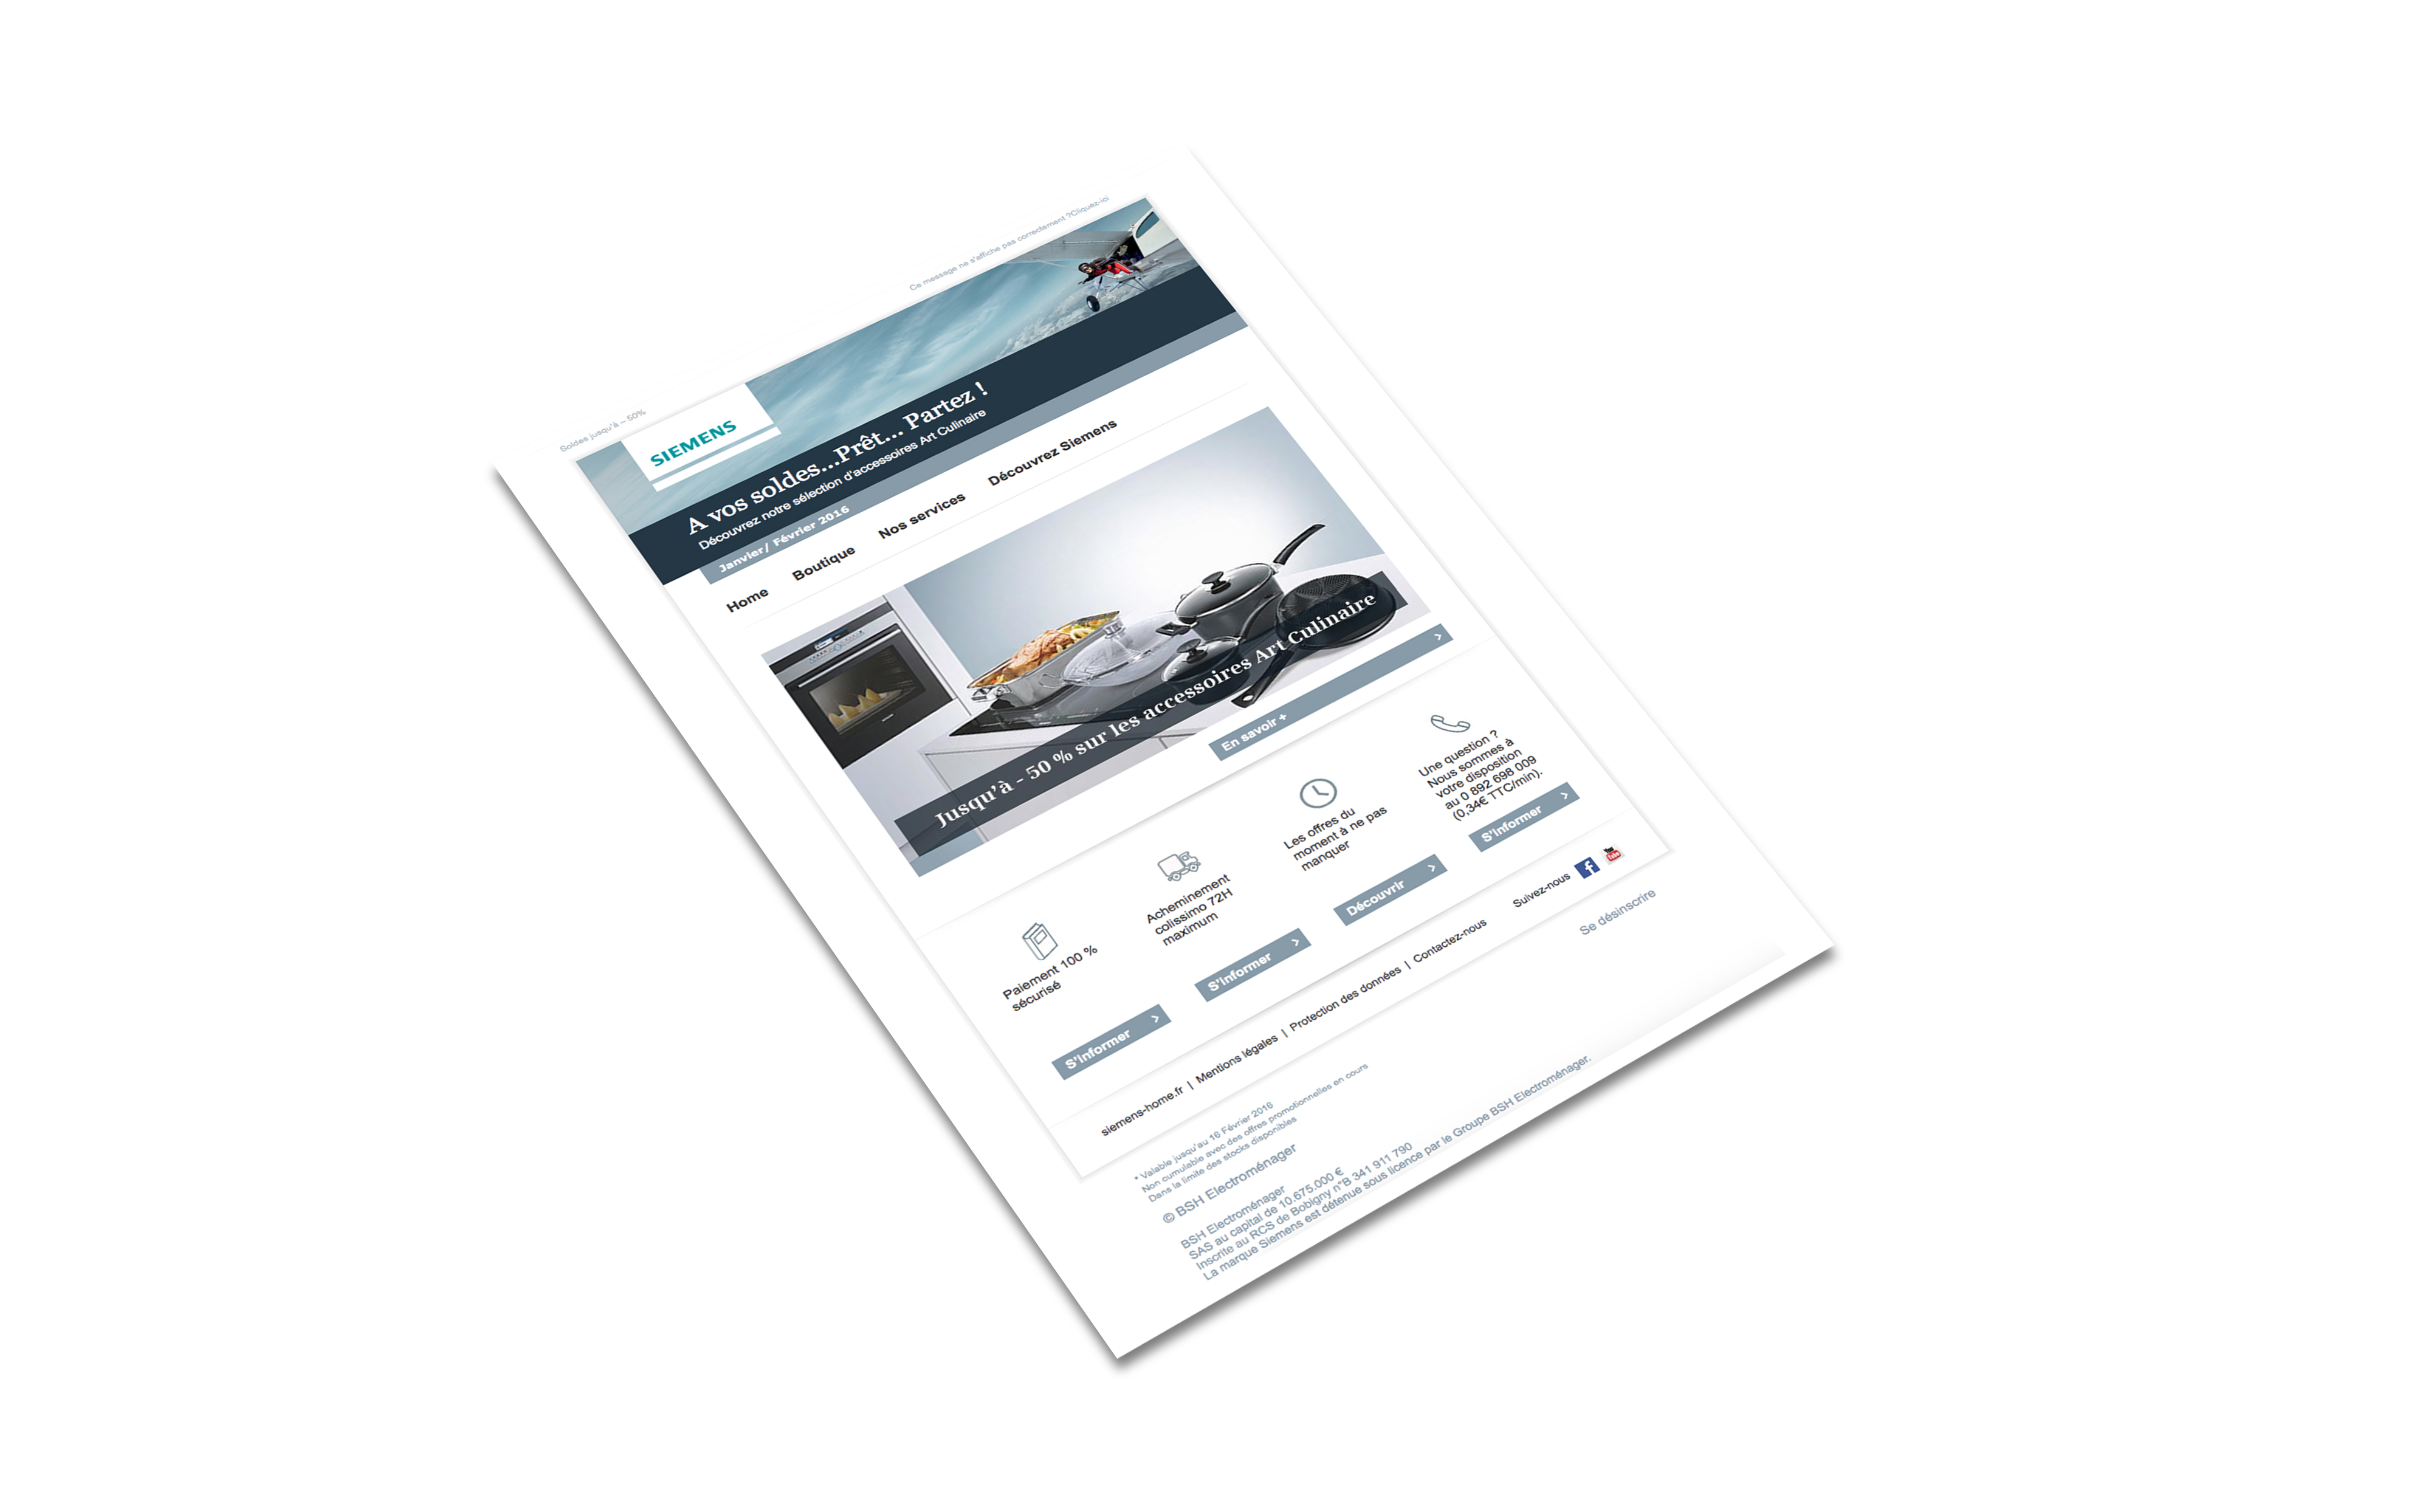 Emailing Siemens Soldes